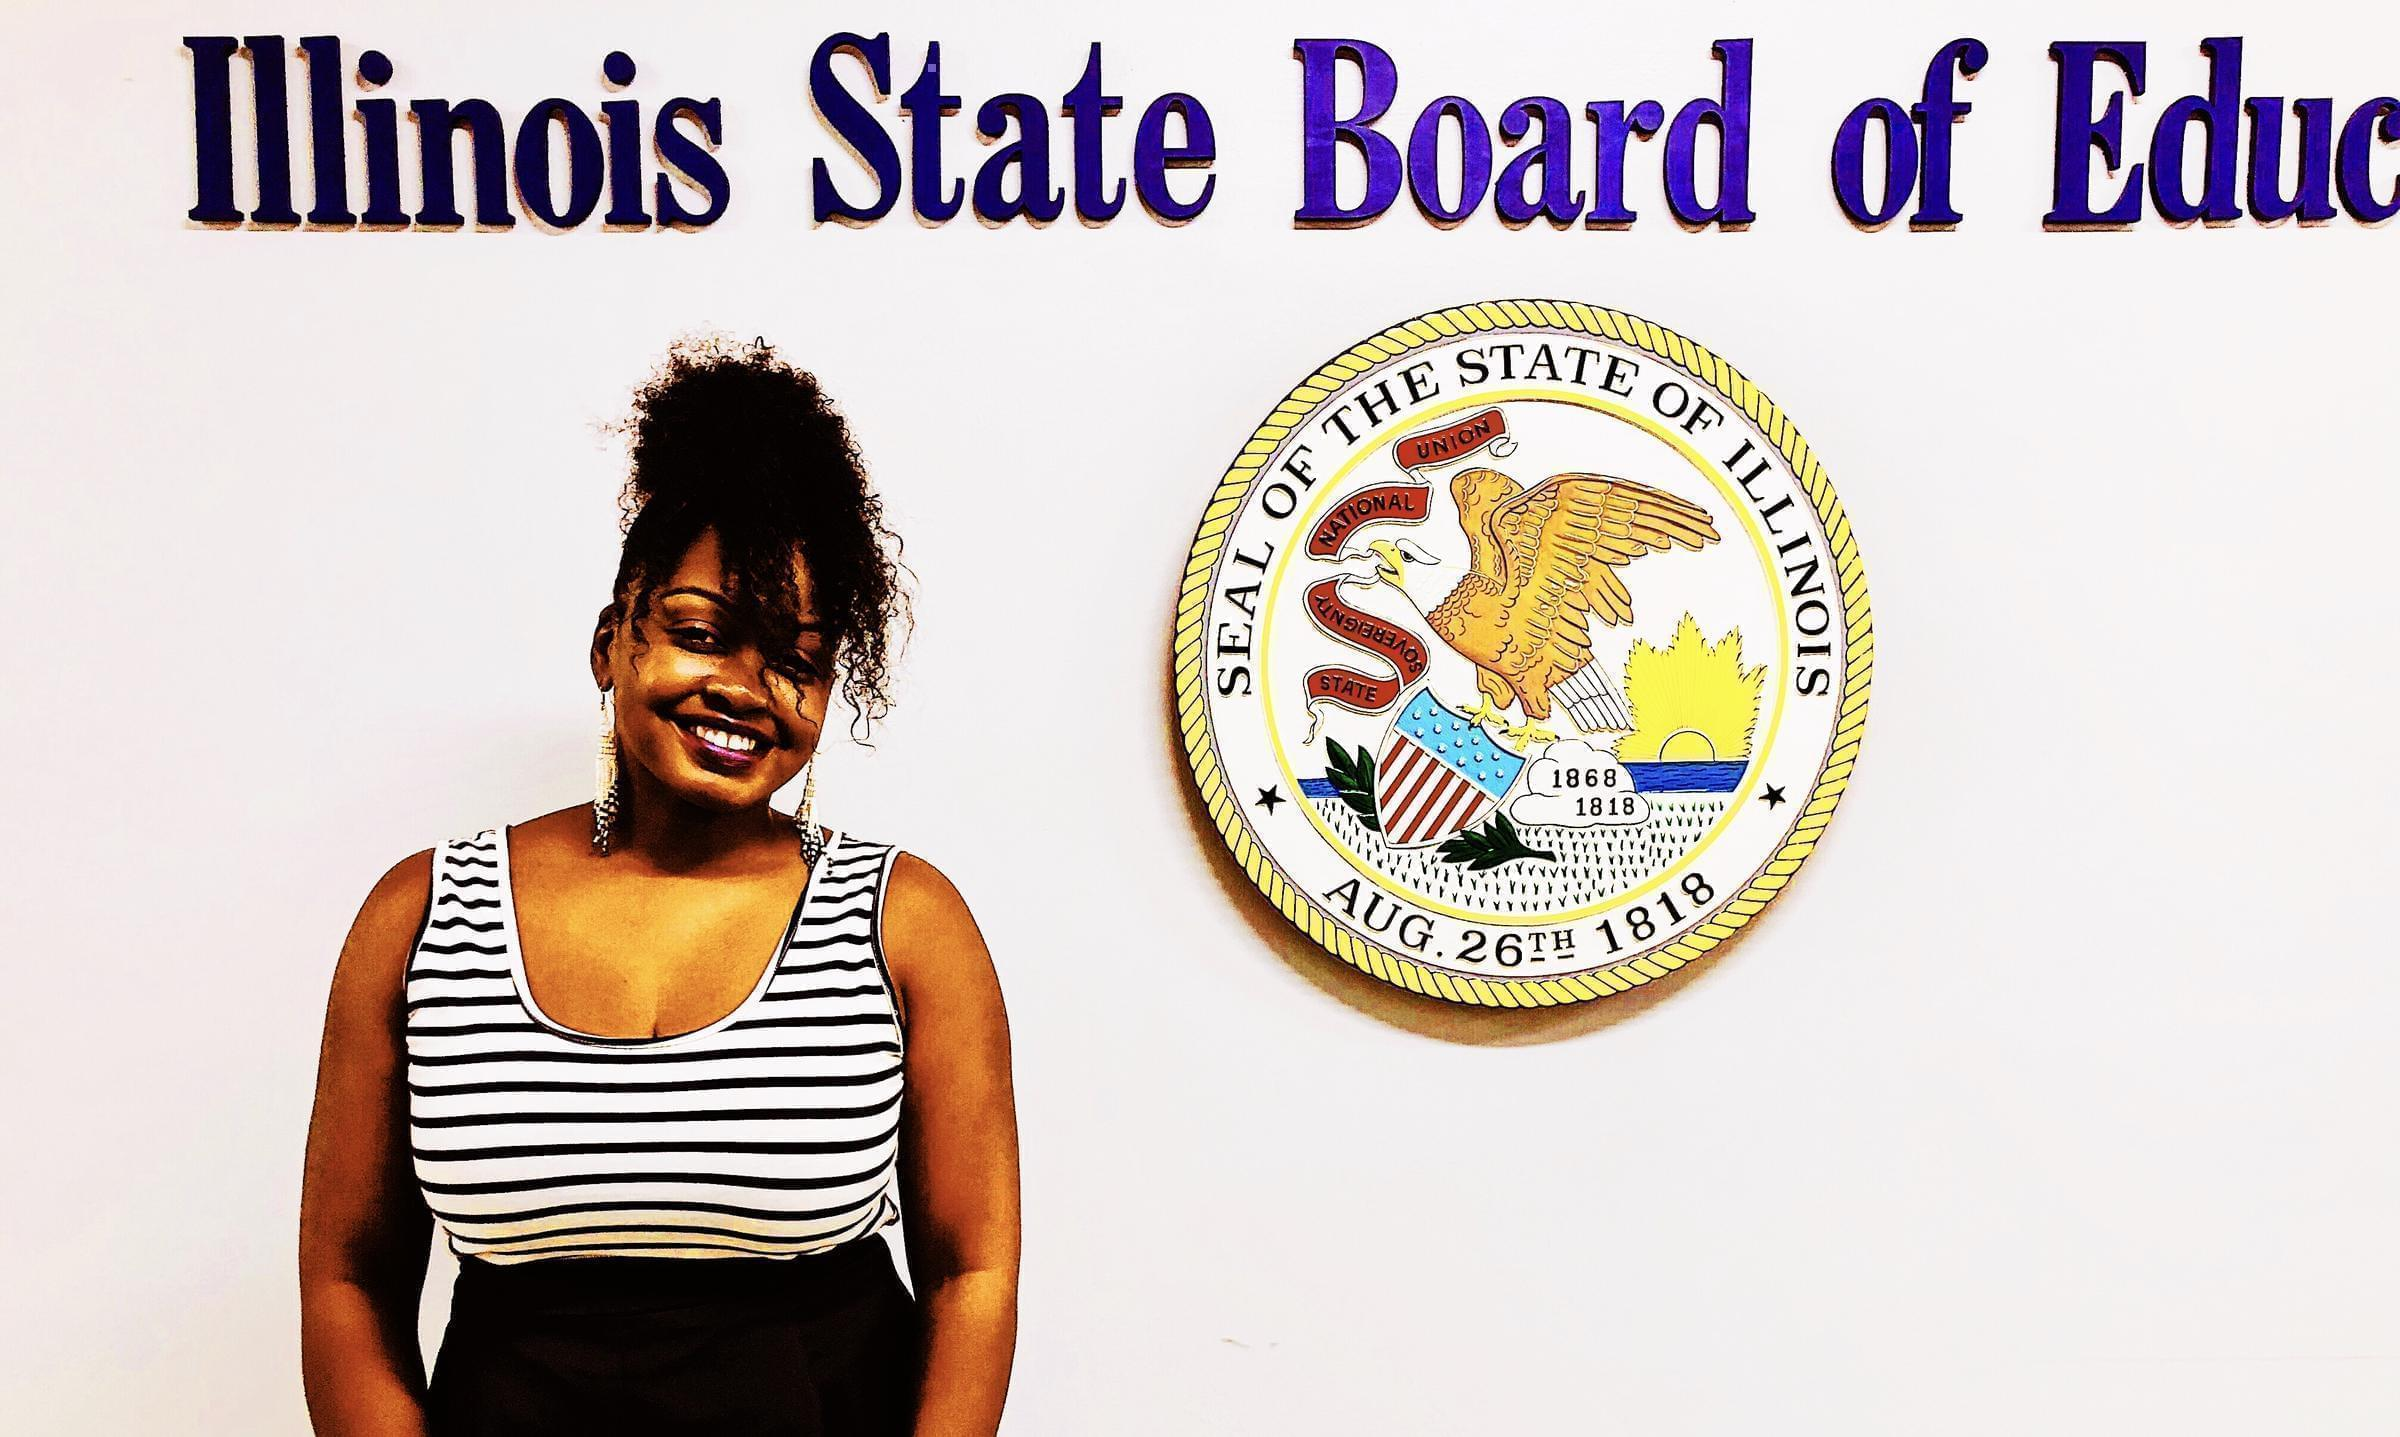 Nakia Hall is a member of the Crete-Monee school board.